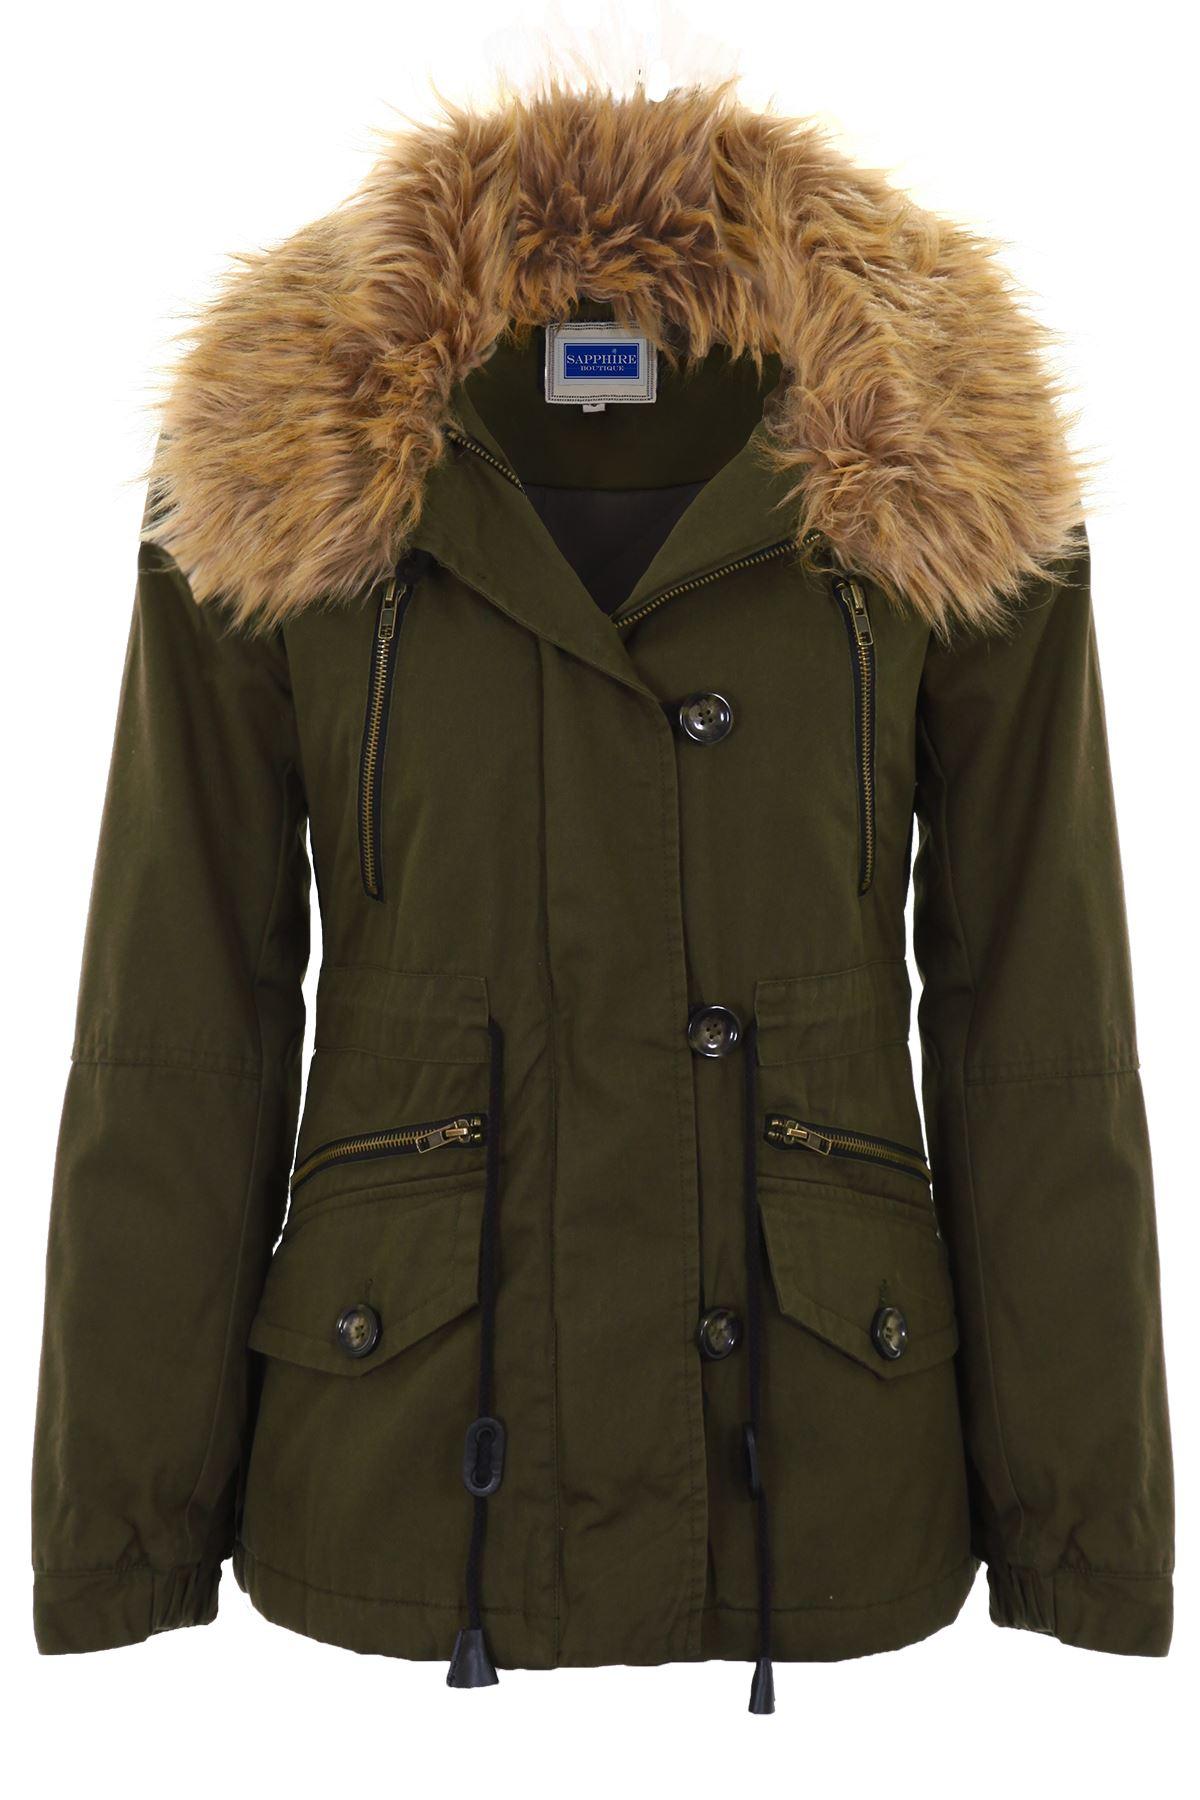 women 39 s lined winter warm faux fur trim ladies parka short. Black Bedroom Furniture Sets. Home Design Ideas